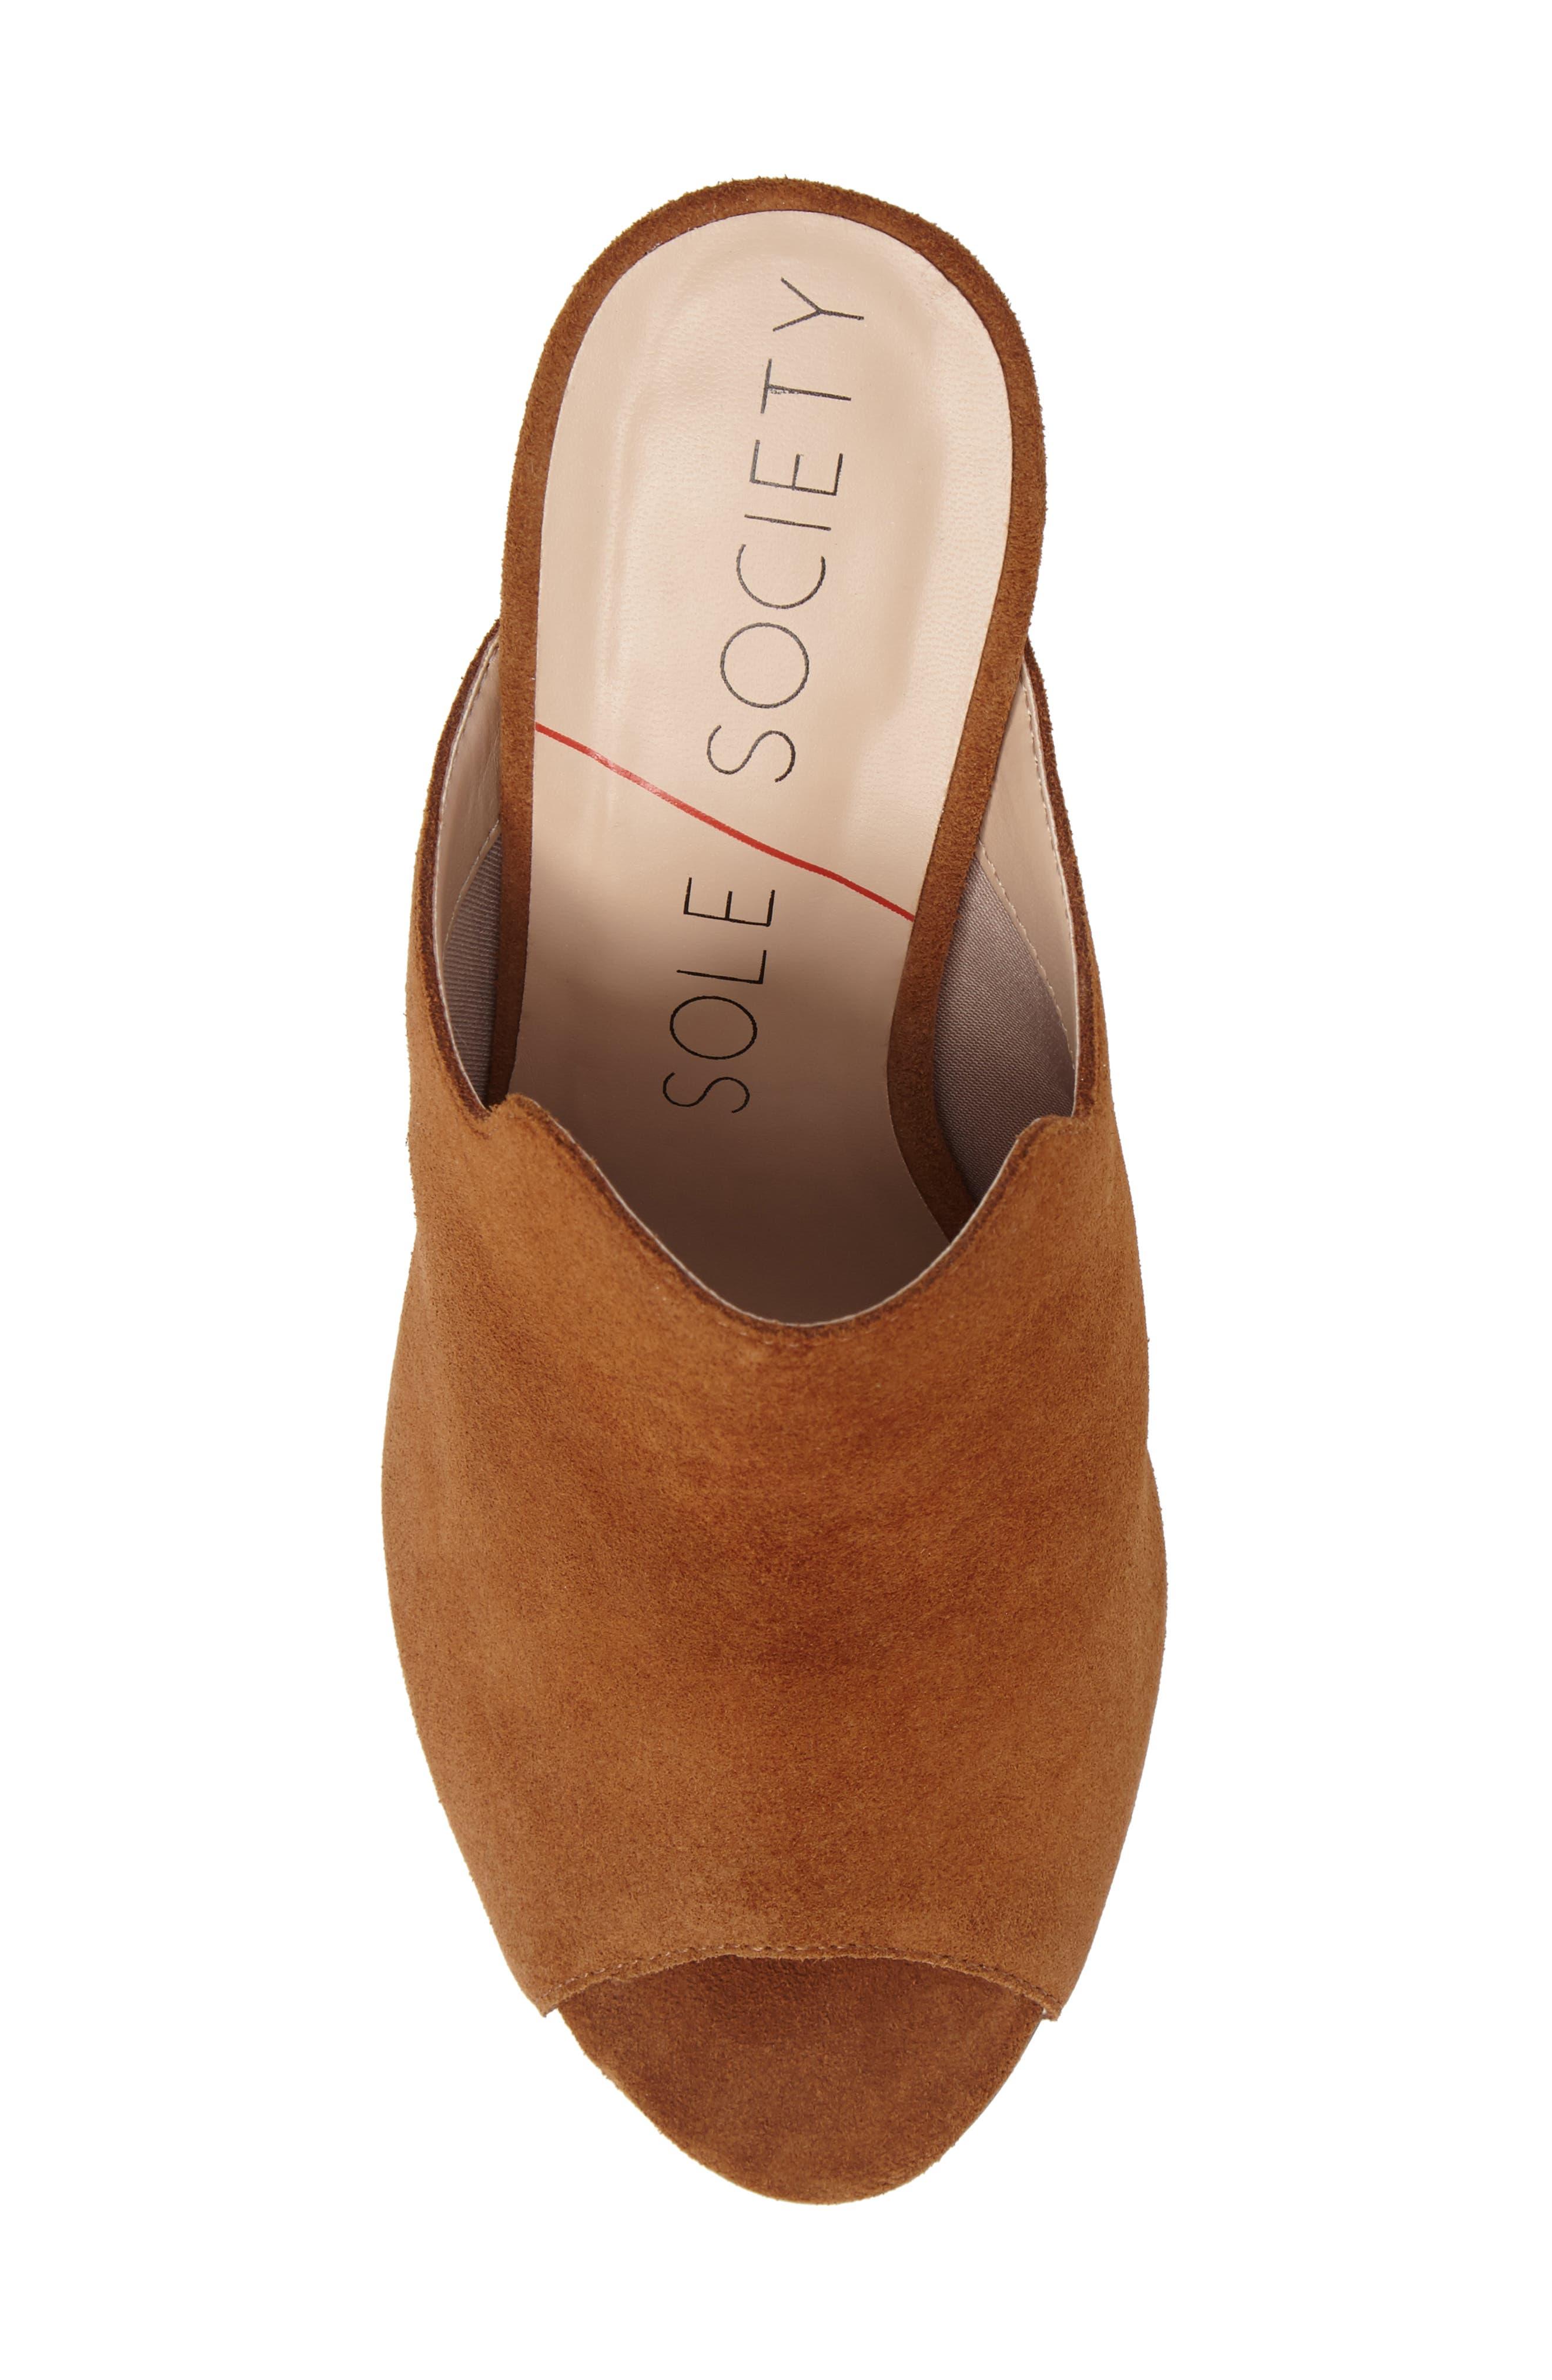 Drew Open-Toe Wedge Mule,                             Alternate thumbnail 5, color,                             Cognac Suede